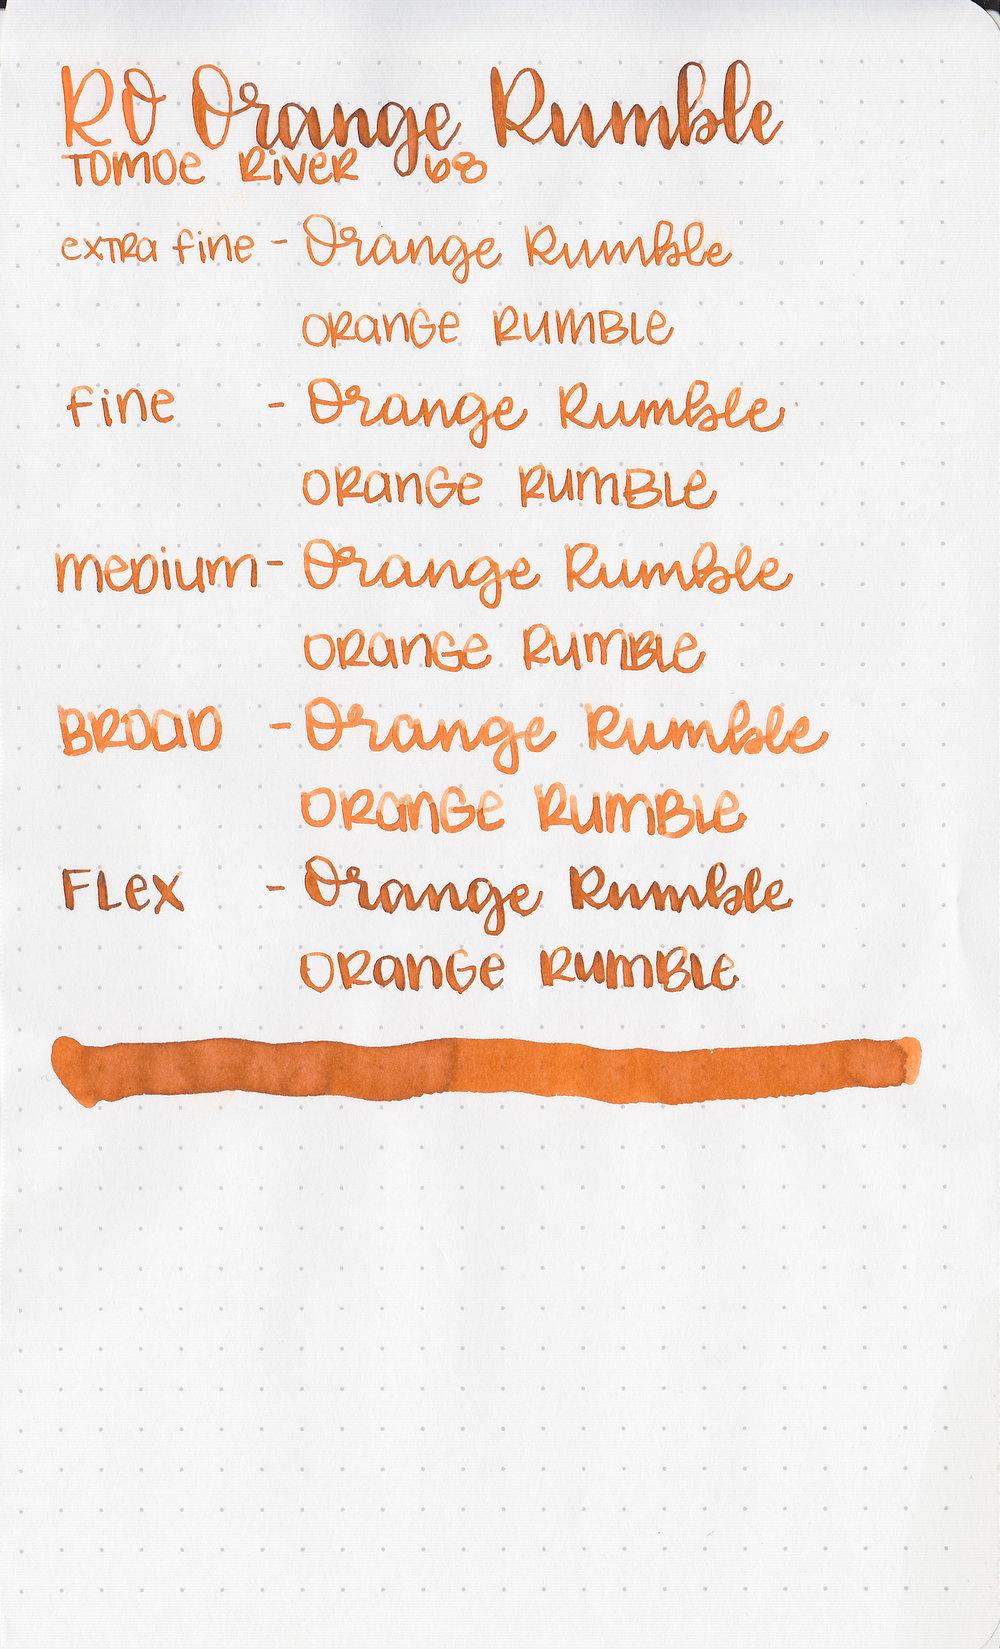 ro-orange-rumble-7.jpg